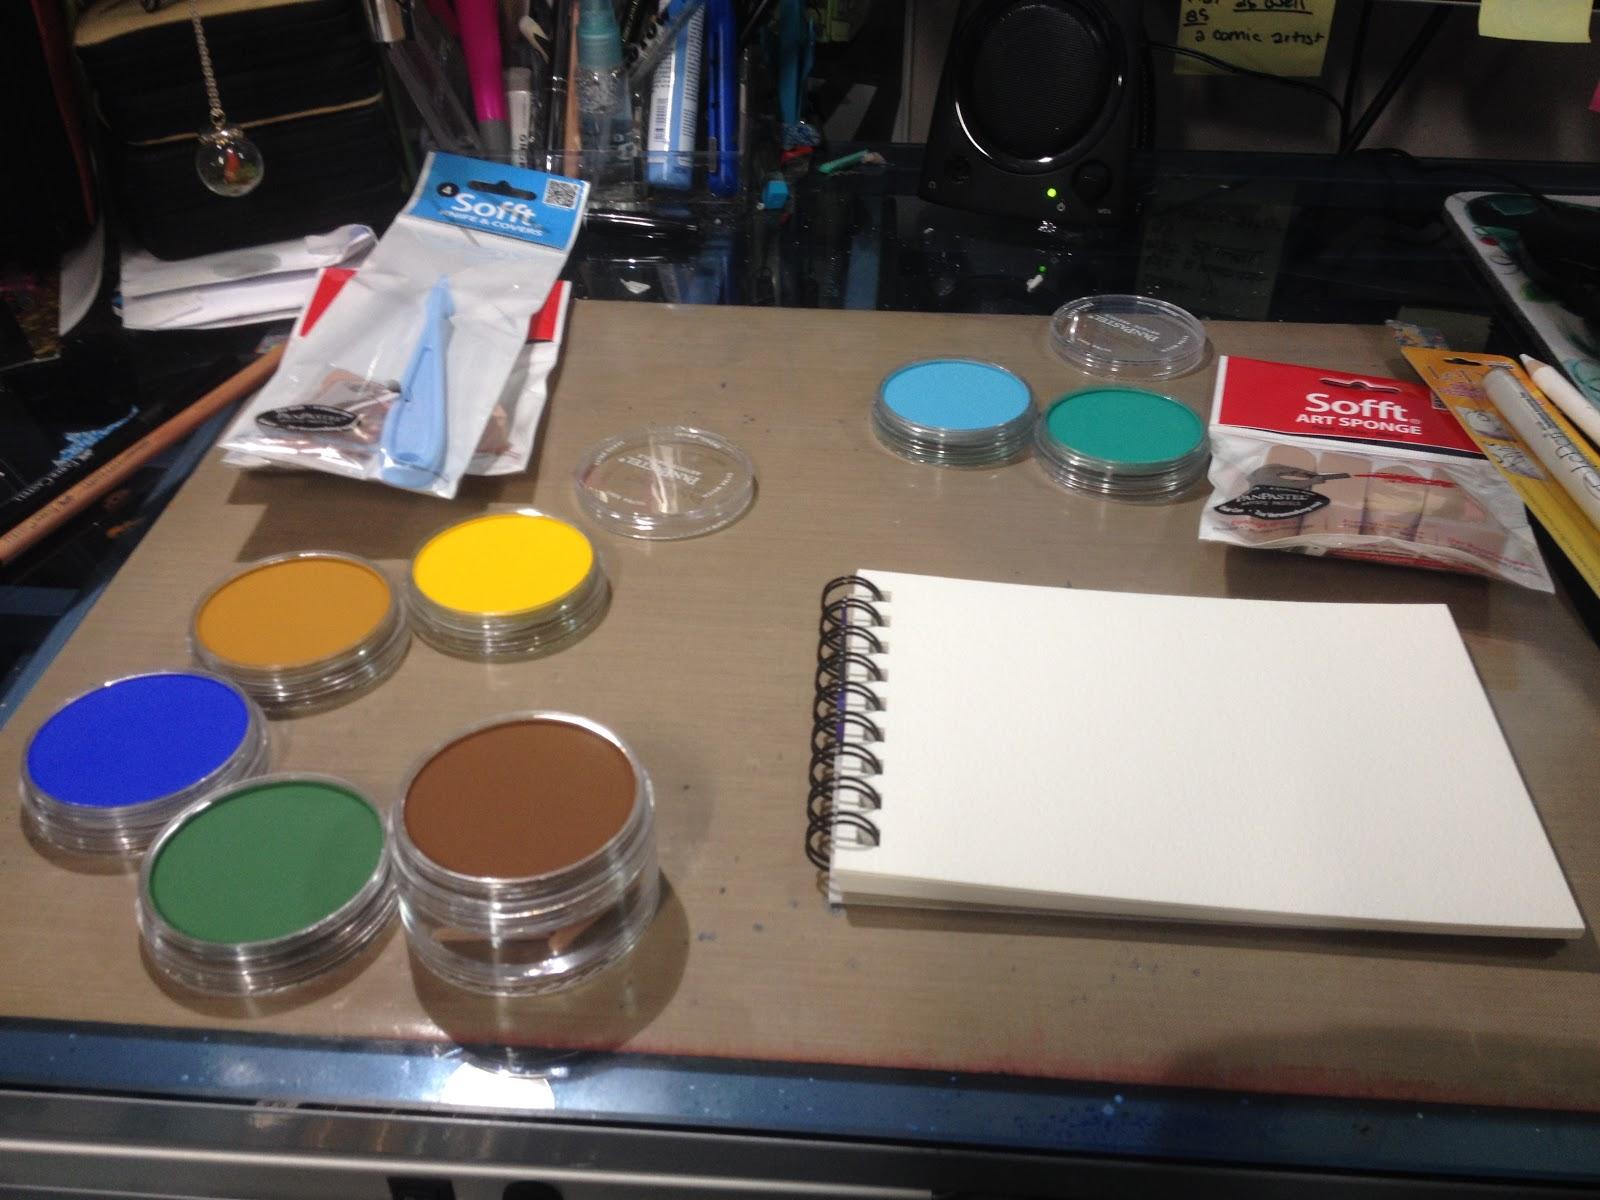 Nattosoup Studio Art And Process Blog June 2016 SketchBox Basic Vs SketchBox Premium